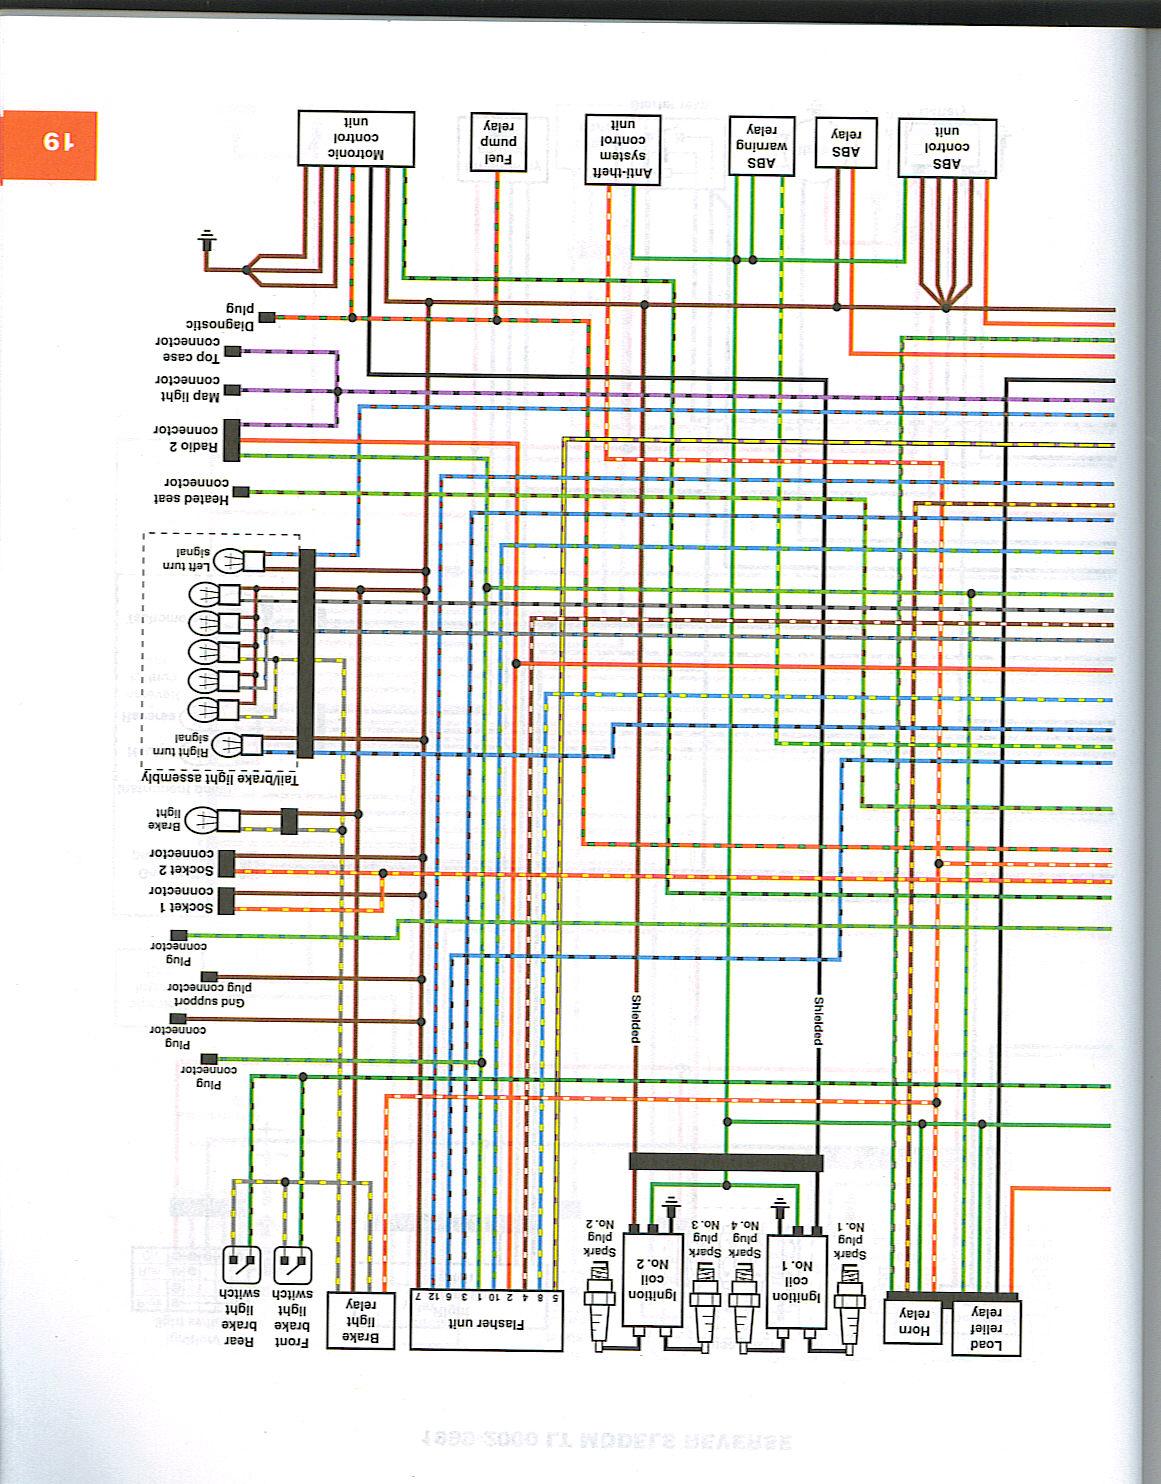 [DIAGRAM_09CH]  D369DA K1200lt Wiring Diagram | Wiring Resources | K1200lt Tape Deck Wiring Diagram |  | Wiring Resources